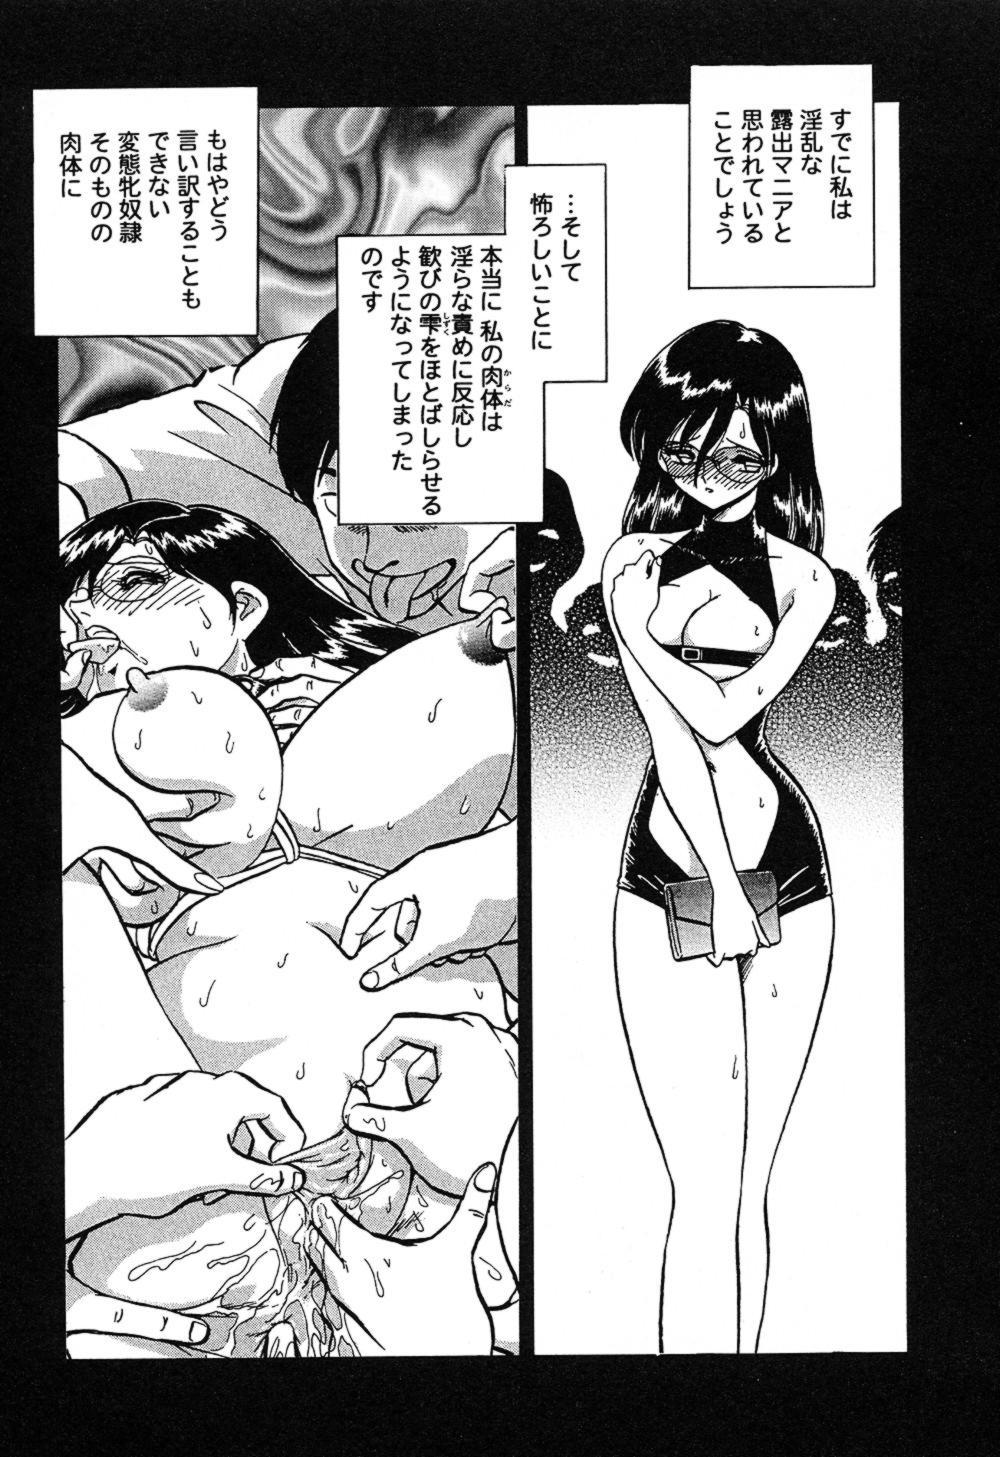 Hageshii Kagai Jugyou 13